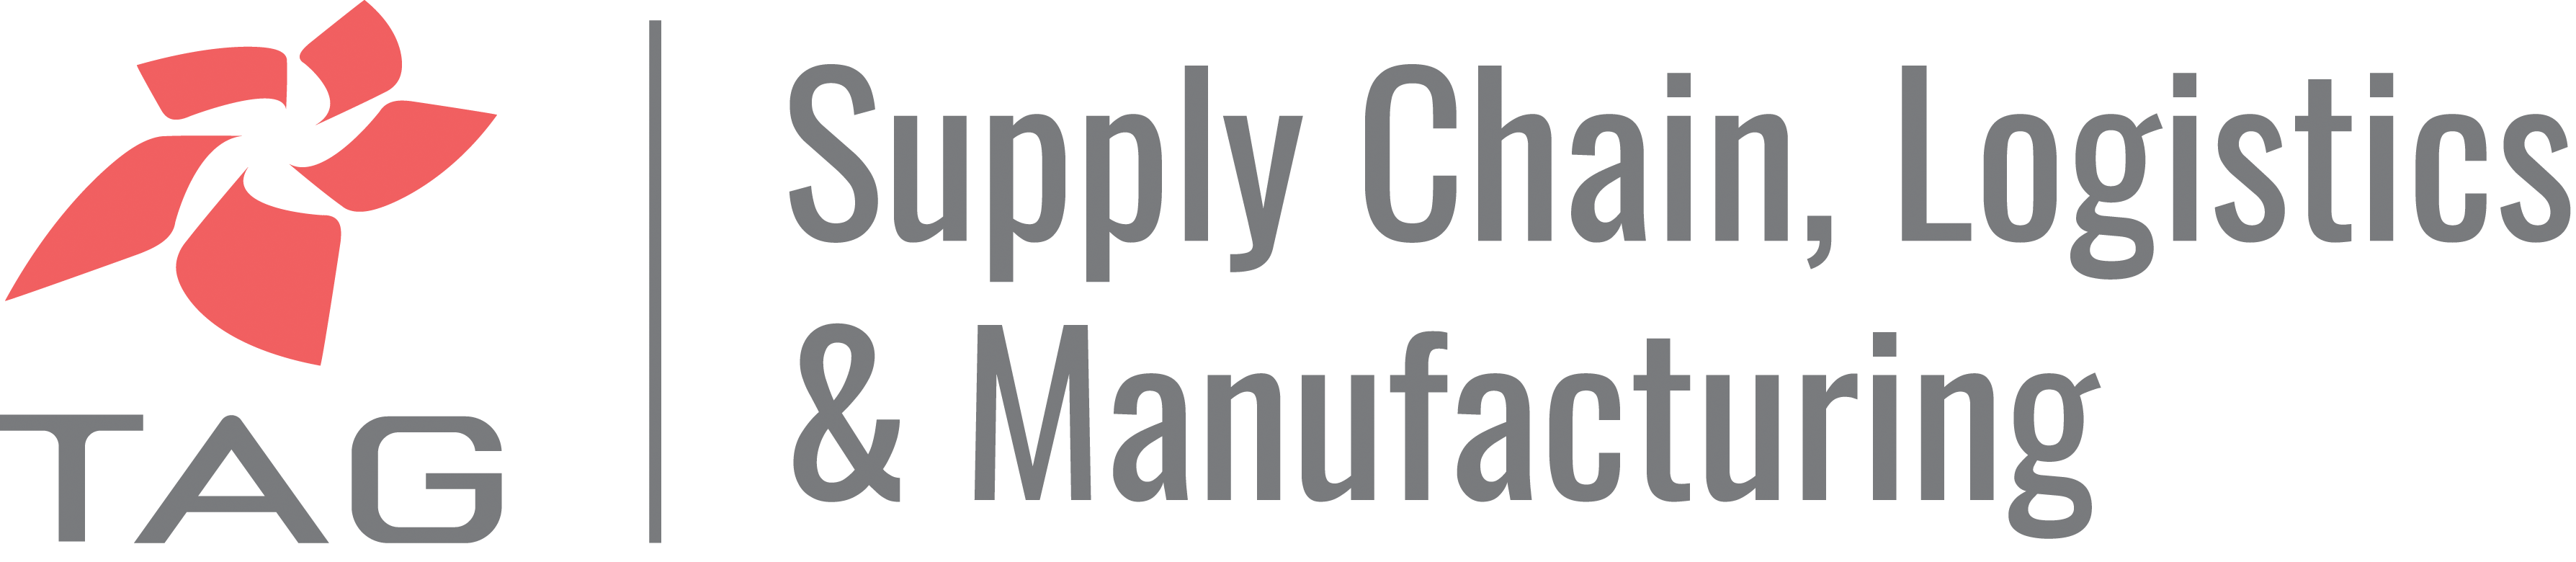 Supply Chain, Logistics & Manufacturing